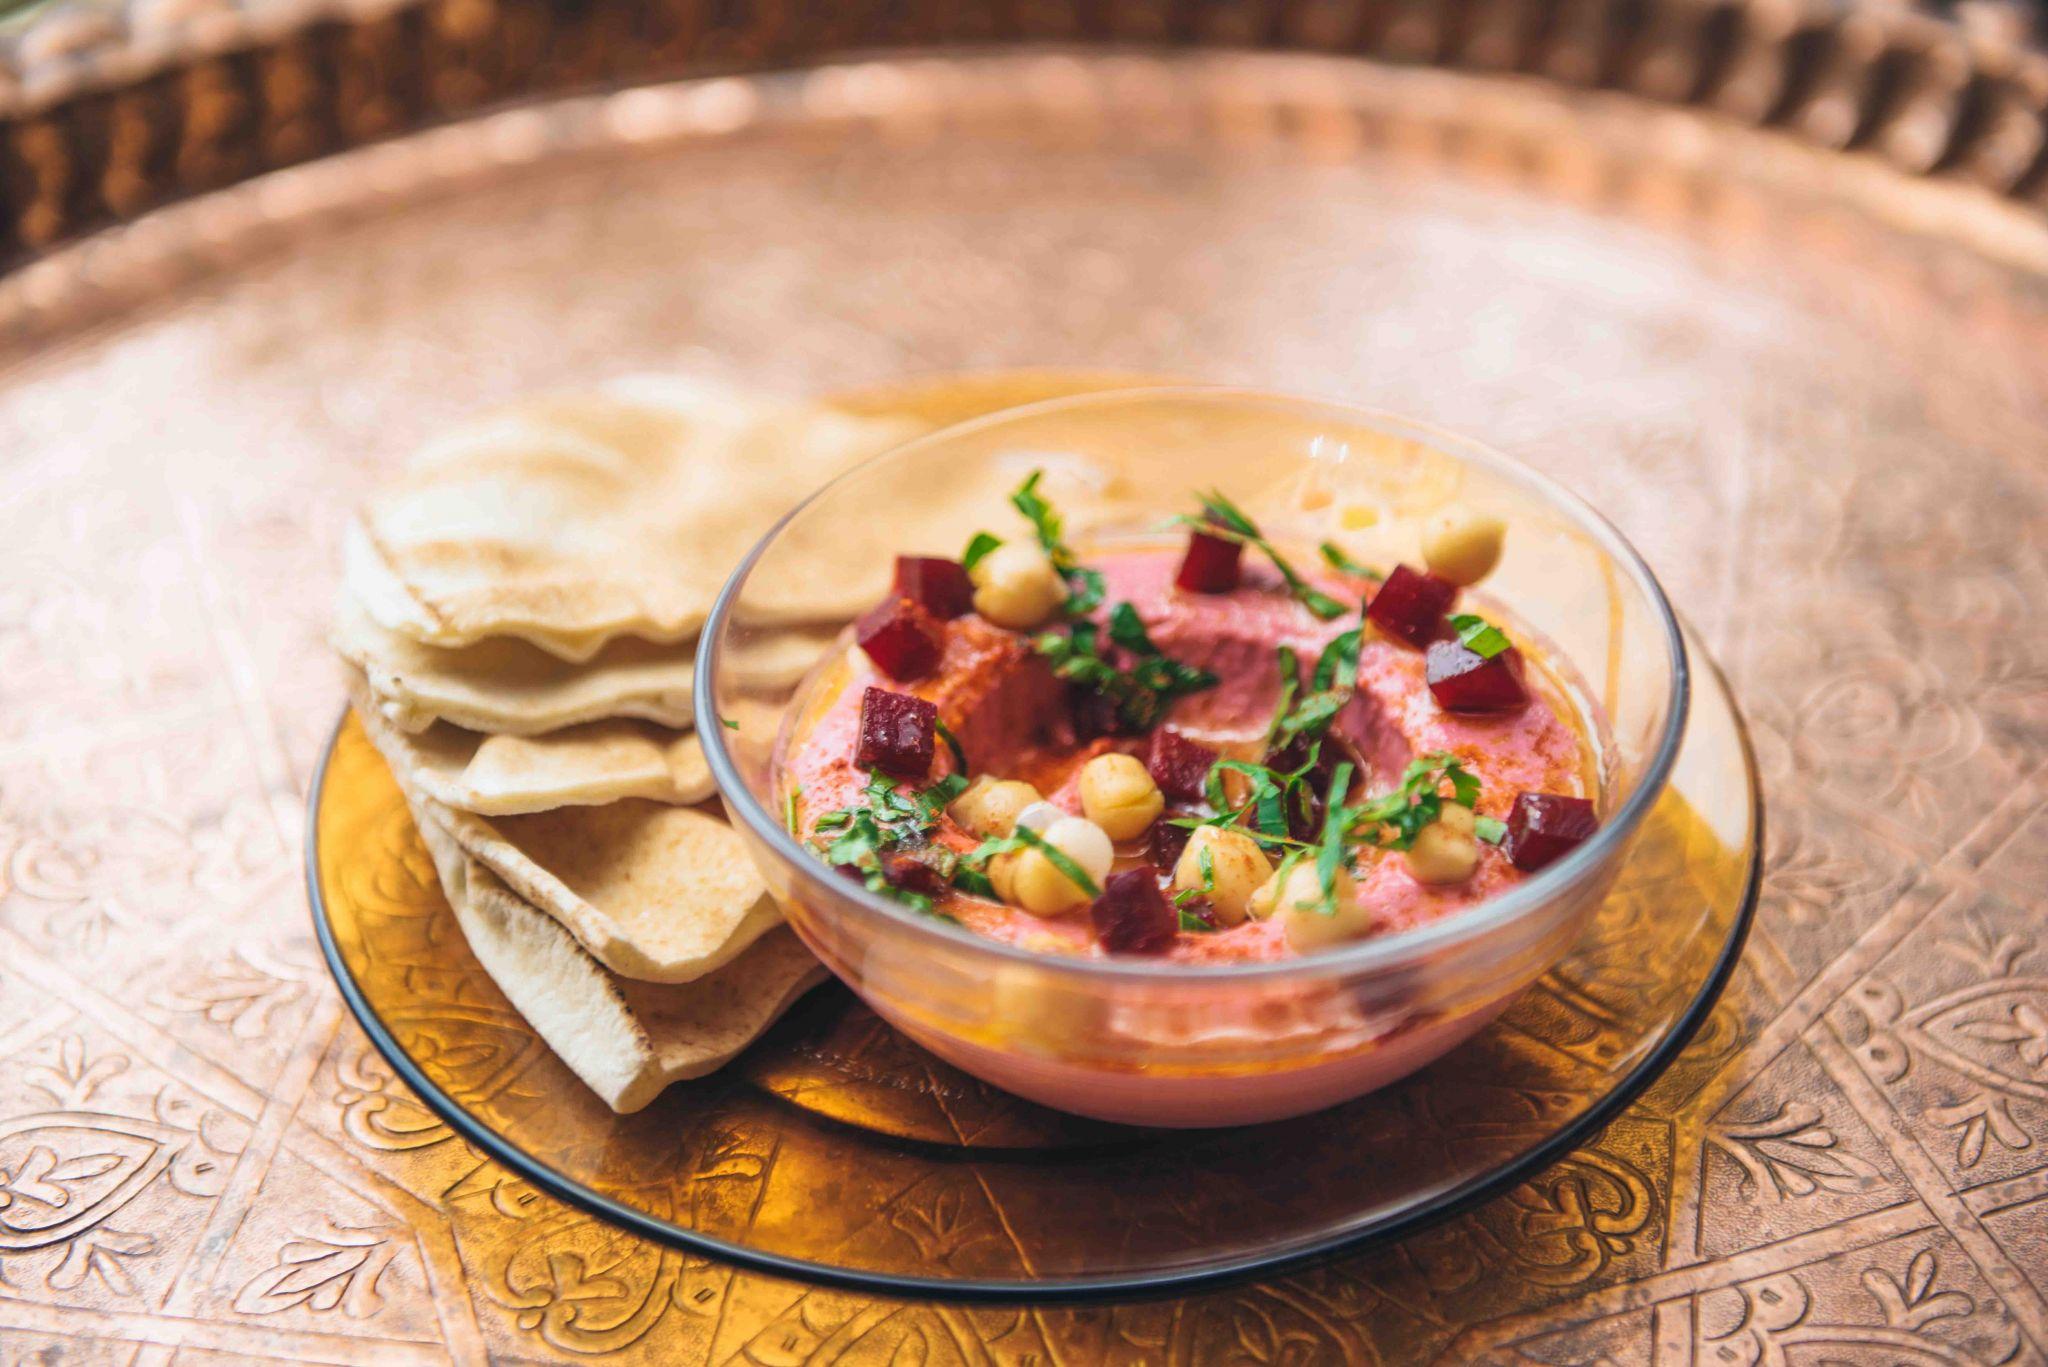 Comptoir-Libanais-Christmas-Menu-Food-Blogger-Manchester-UK-Beetroot-Labne